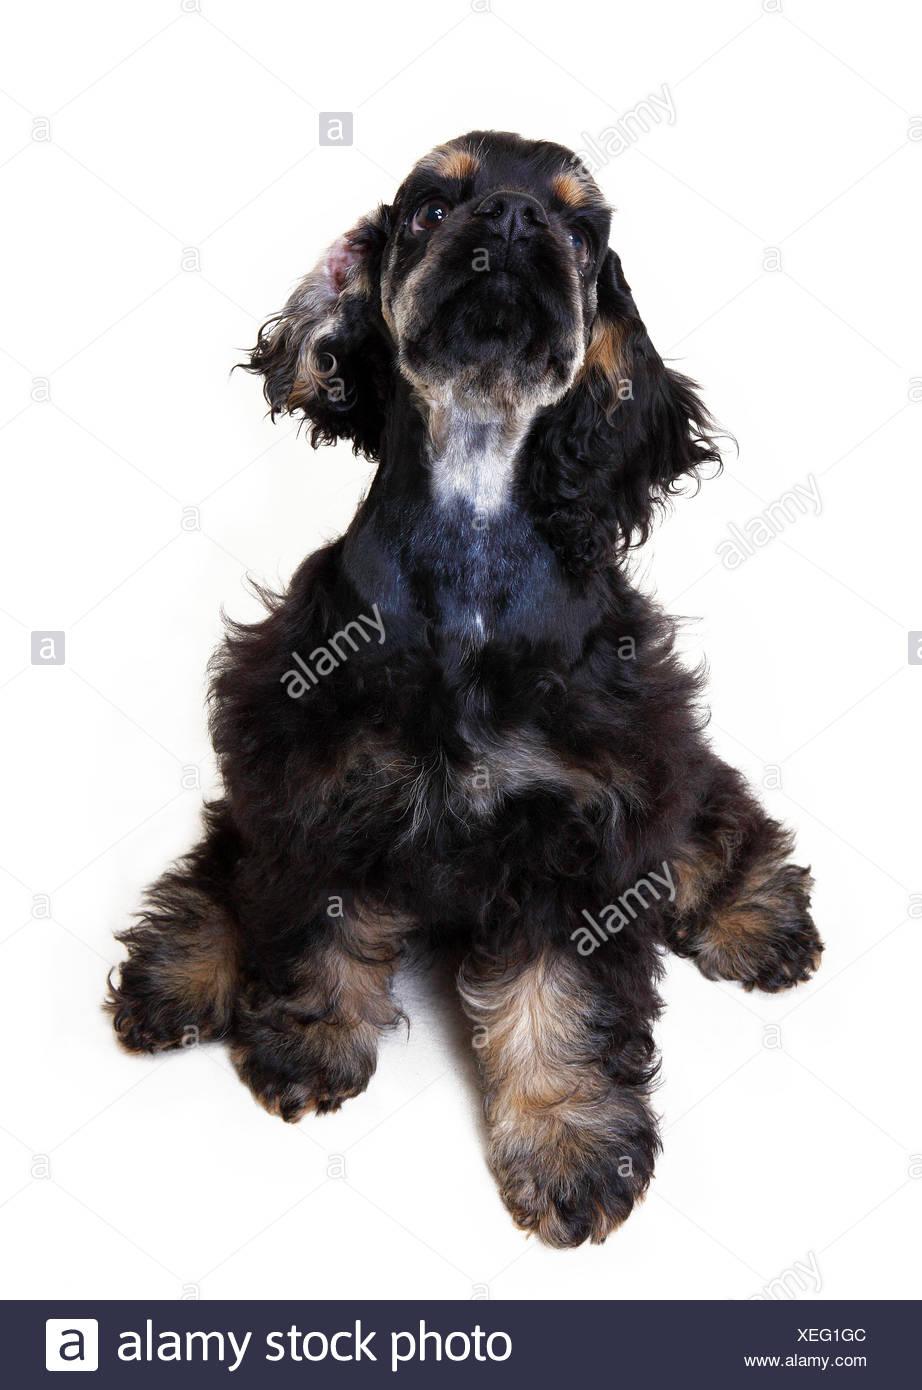 An American cocker spaniel dog - Stock Image